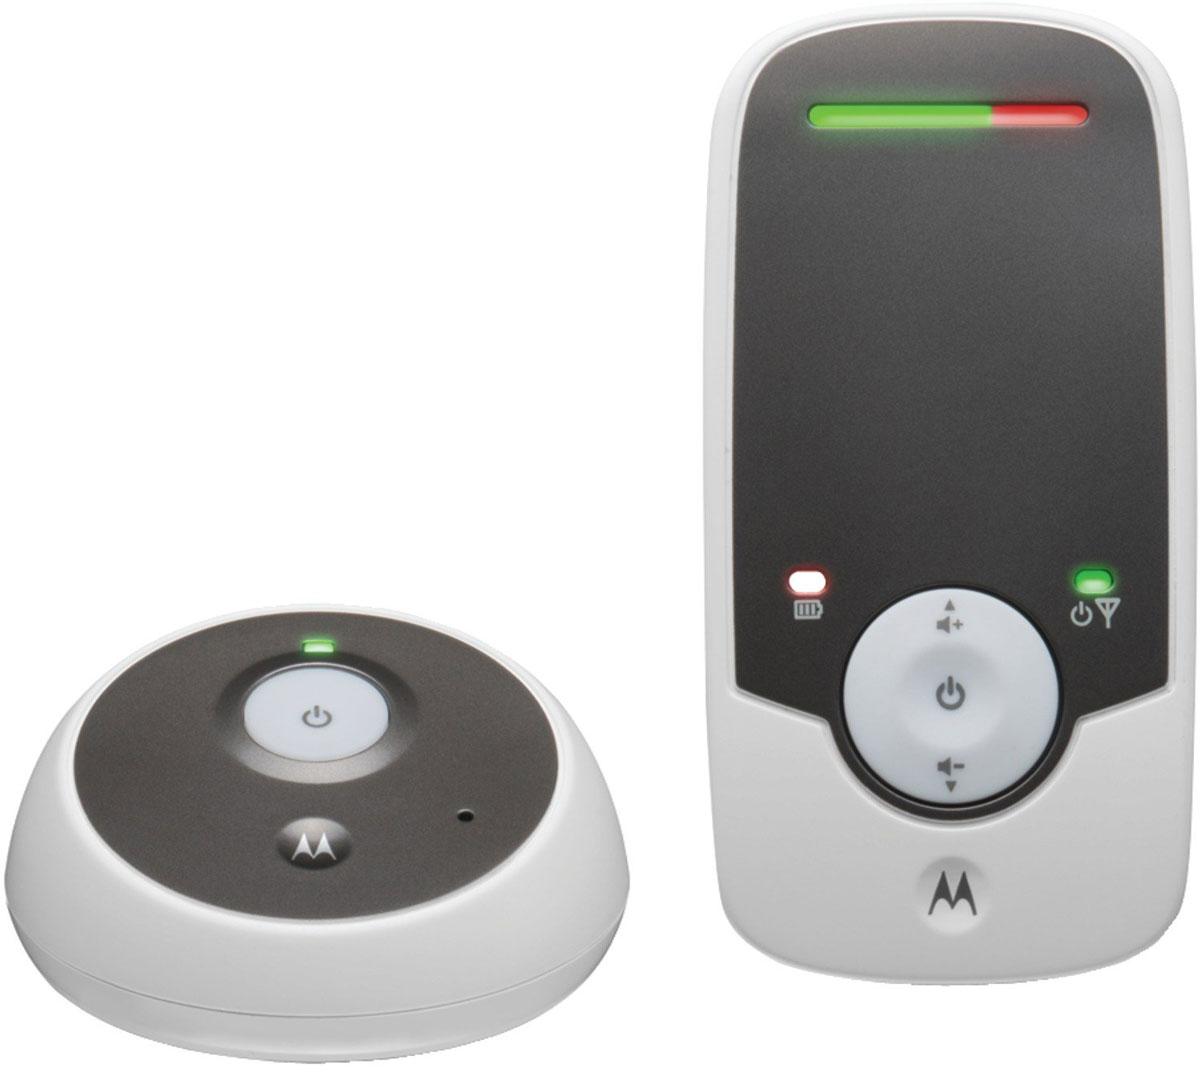 Motorola МВР160, White Black радионяня MBP160